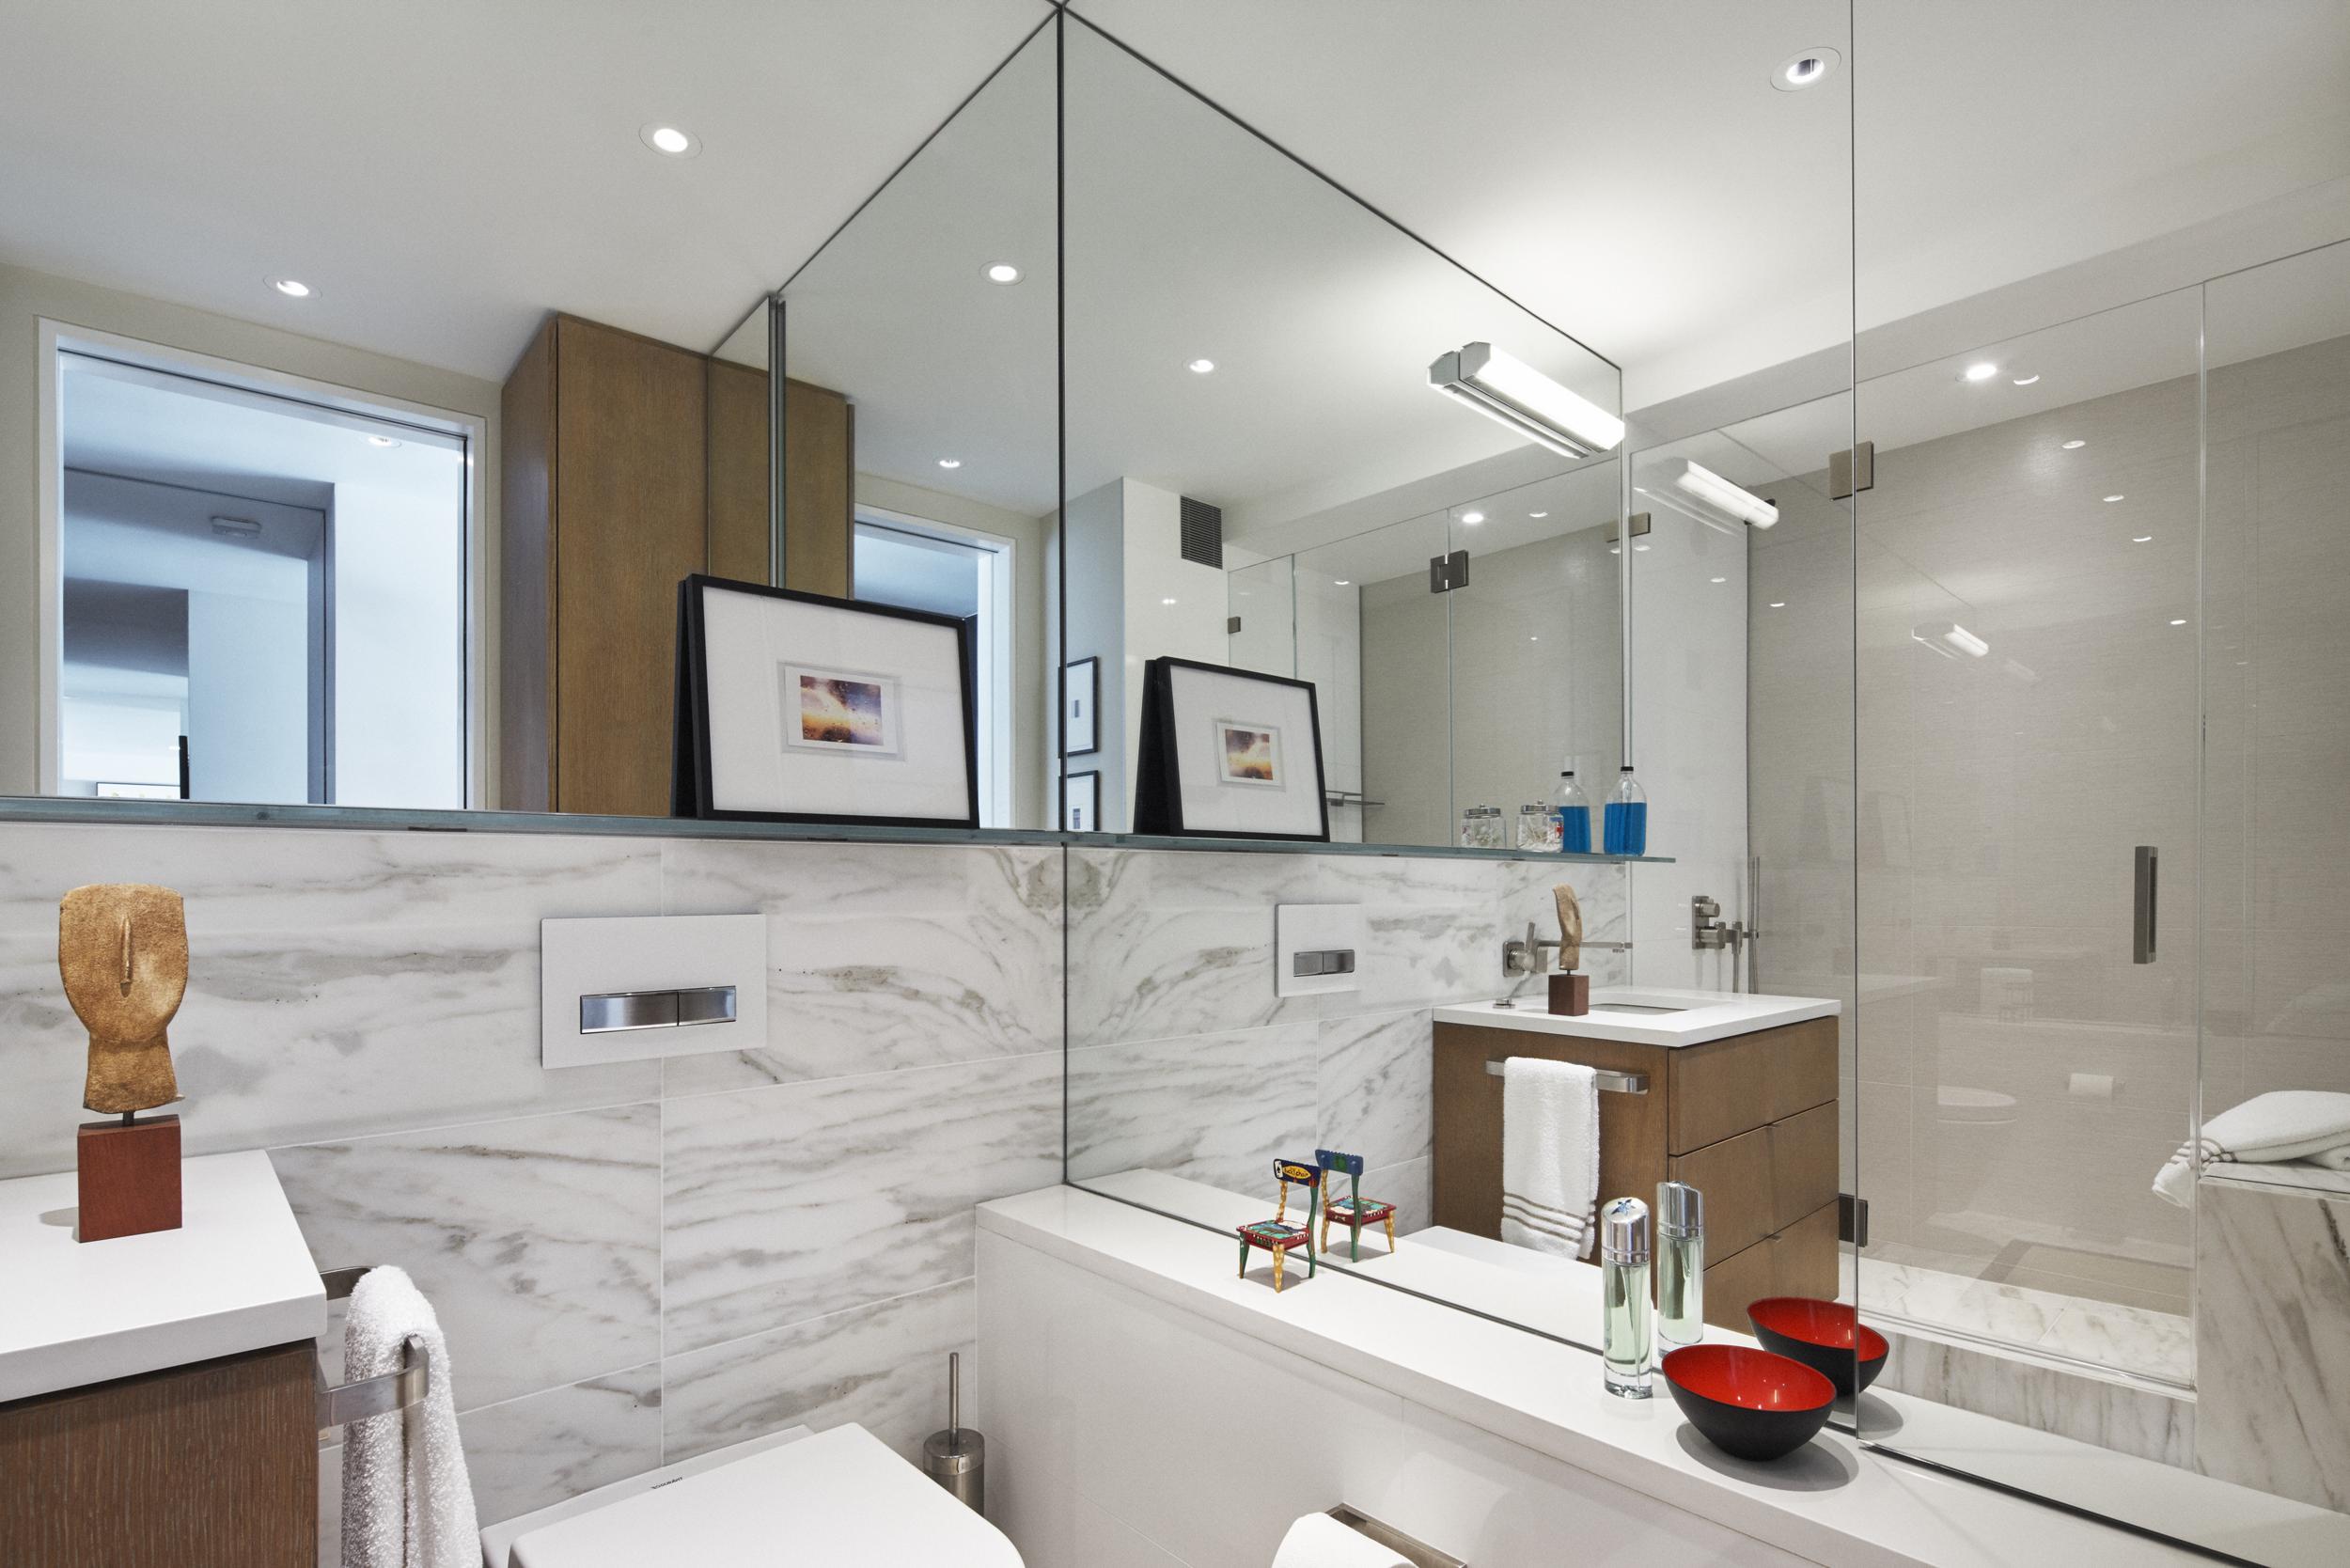 Lincoln Square Residence Bathroom Design